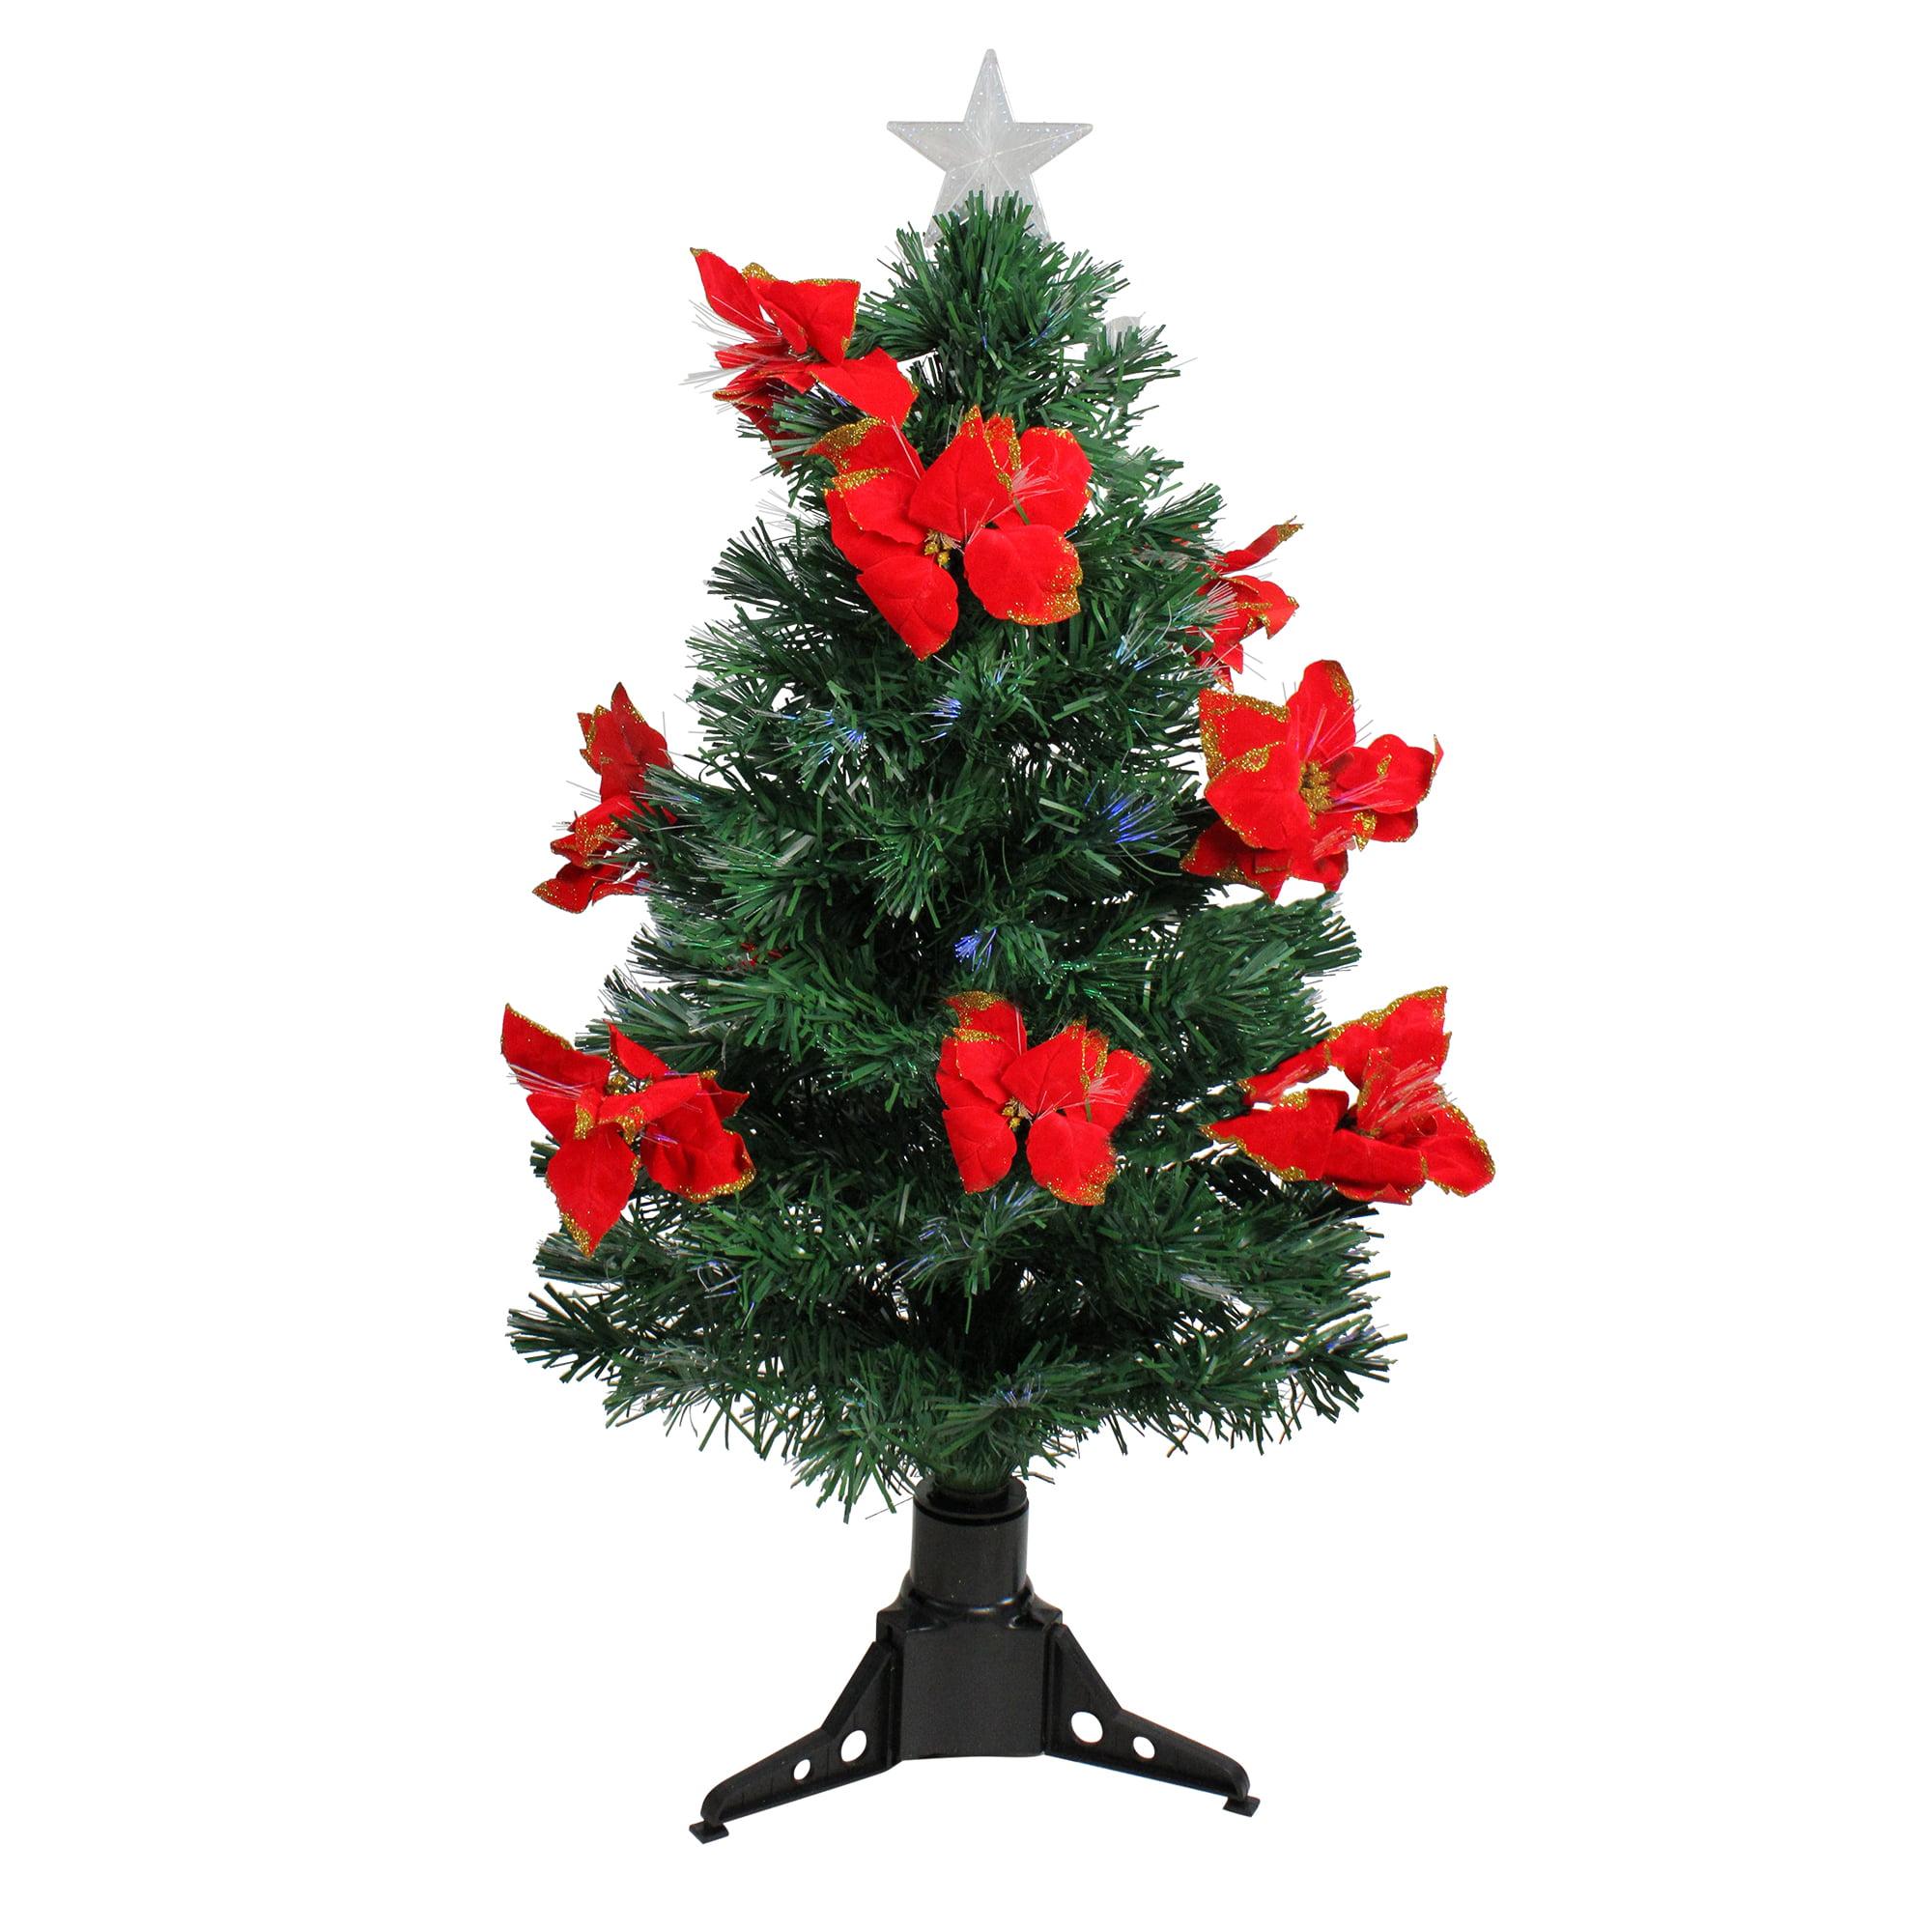 Pointsetta Christmas Tree.Northlight 3 Prelit Artificial Christmas Tree Fiber Optic With Red Poinsettias Multi Lights